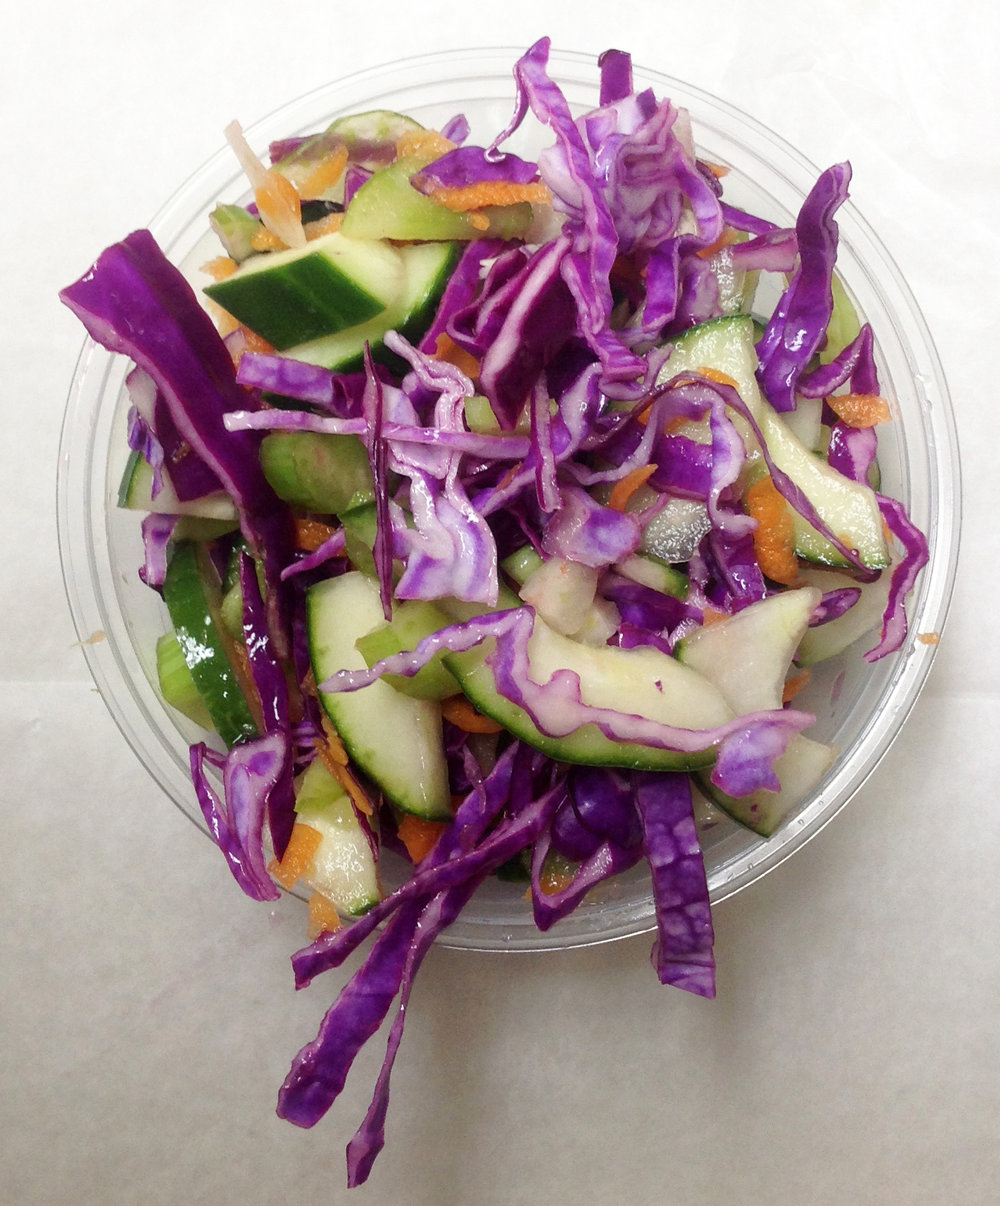 Mixed-veg-in-citrus.-Celery-carrot-cuc-red-cab.jpg